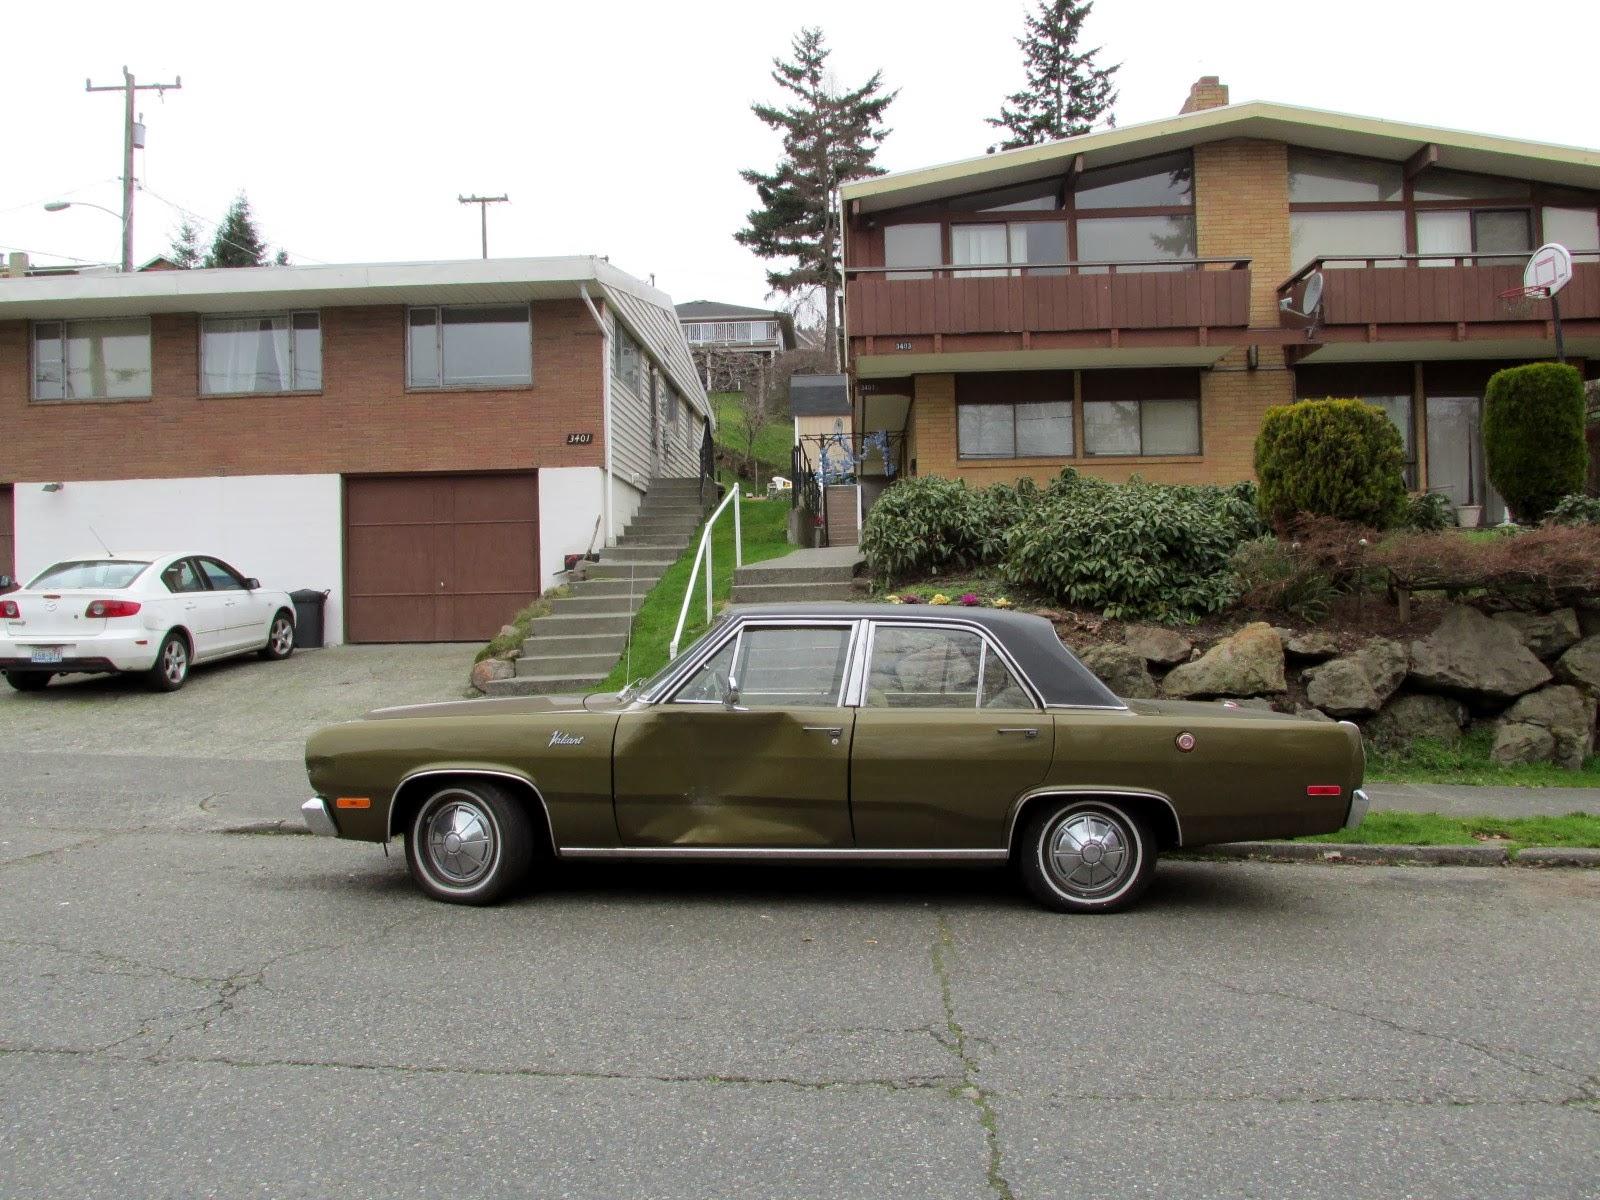 medium resolution of 1970 plymouth valiant sedan